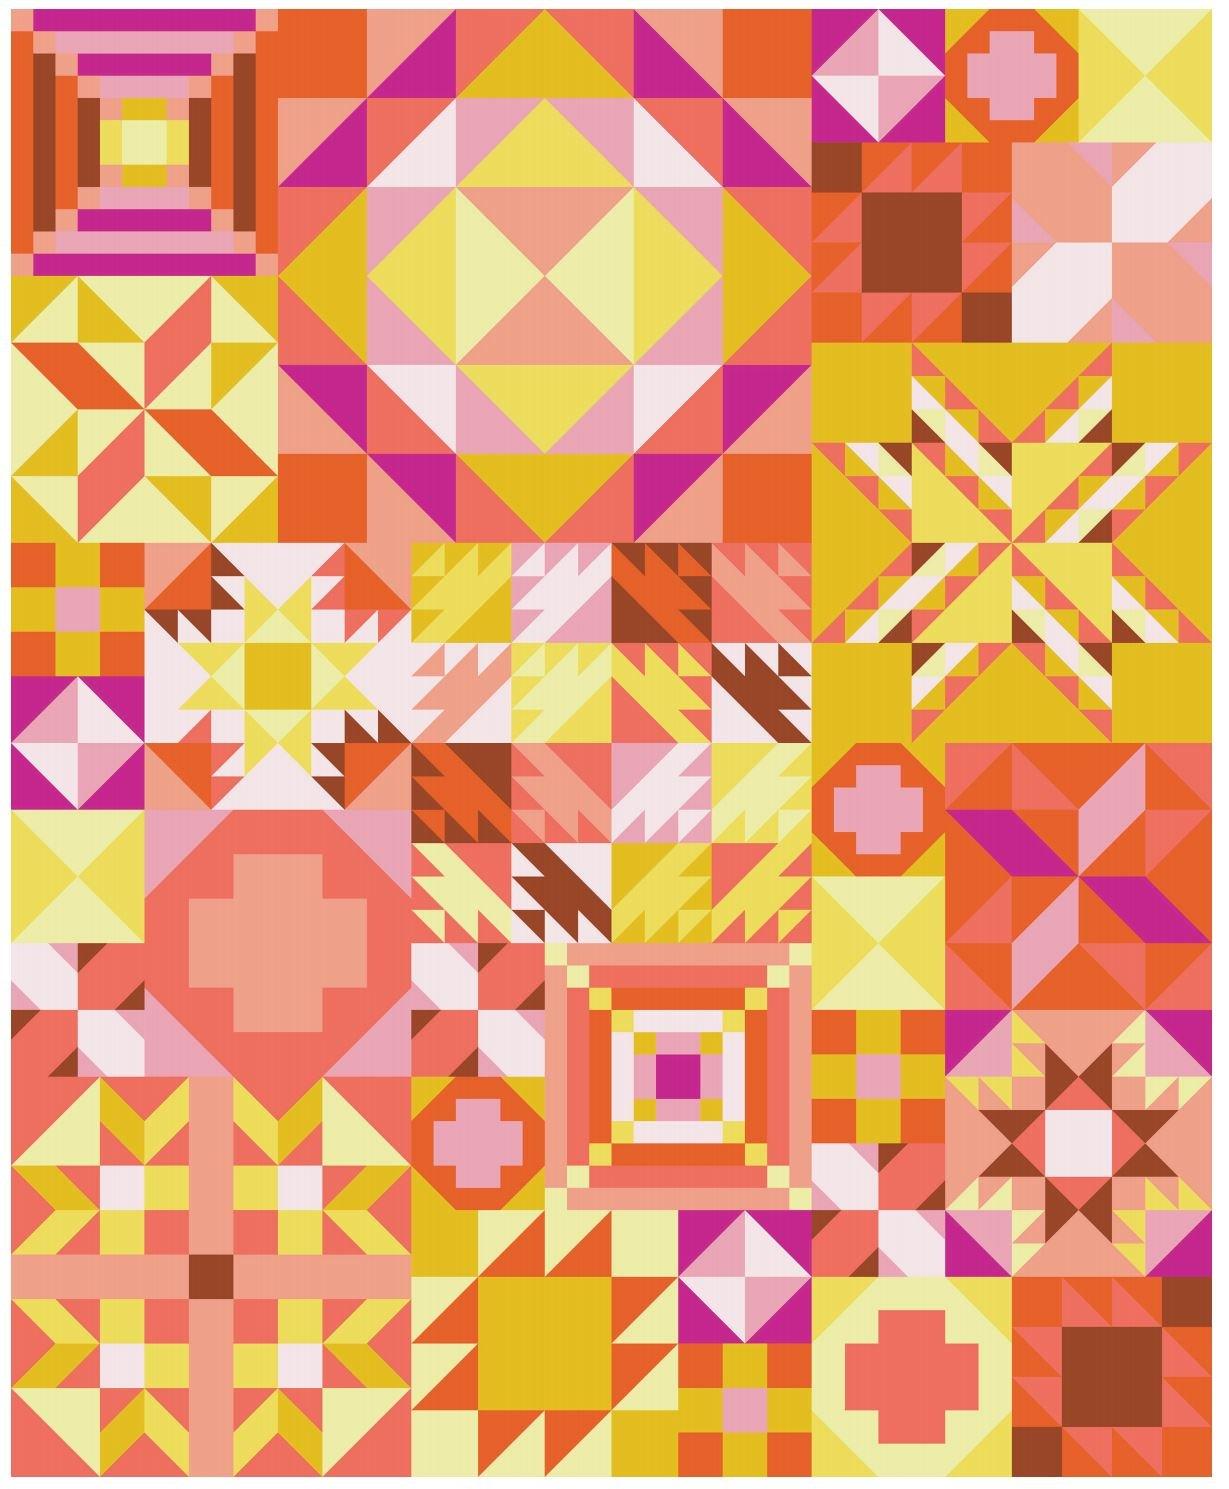 My Favorite Color Is Moda - Pink Lemonade Quilt Kit - 81 x 99